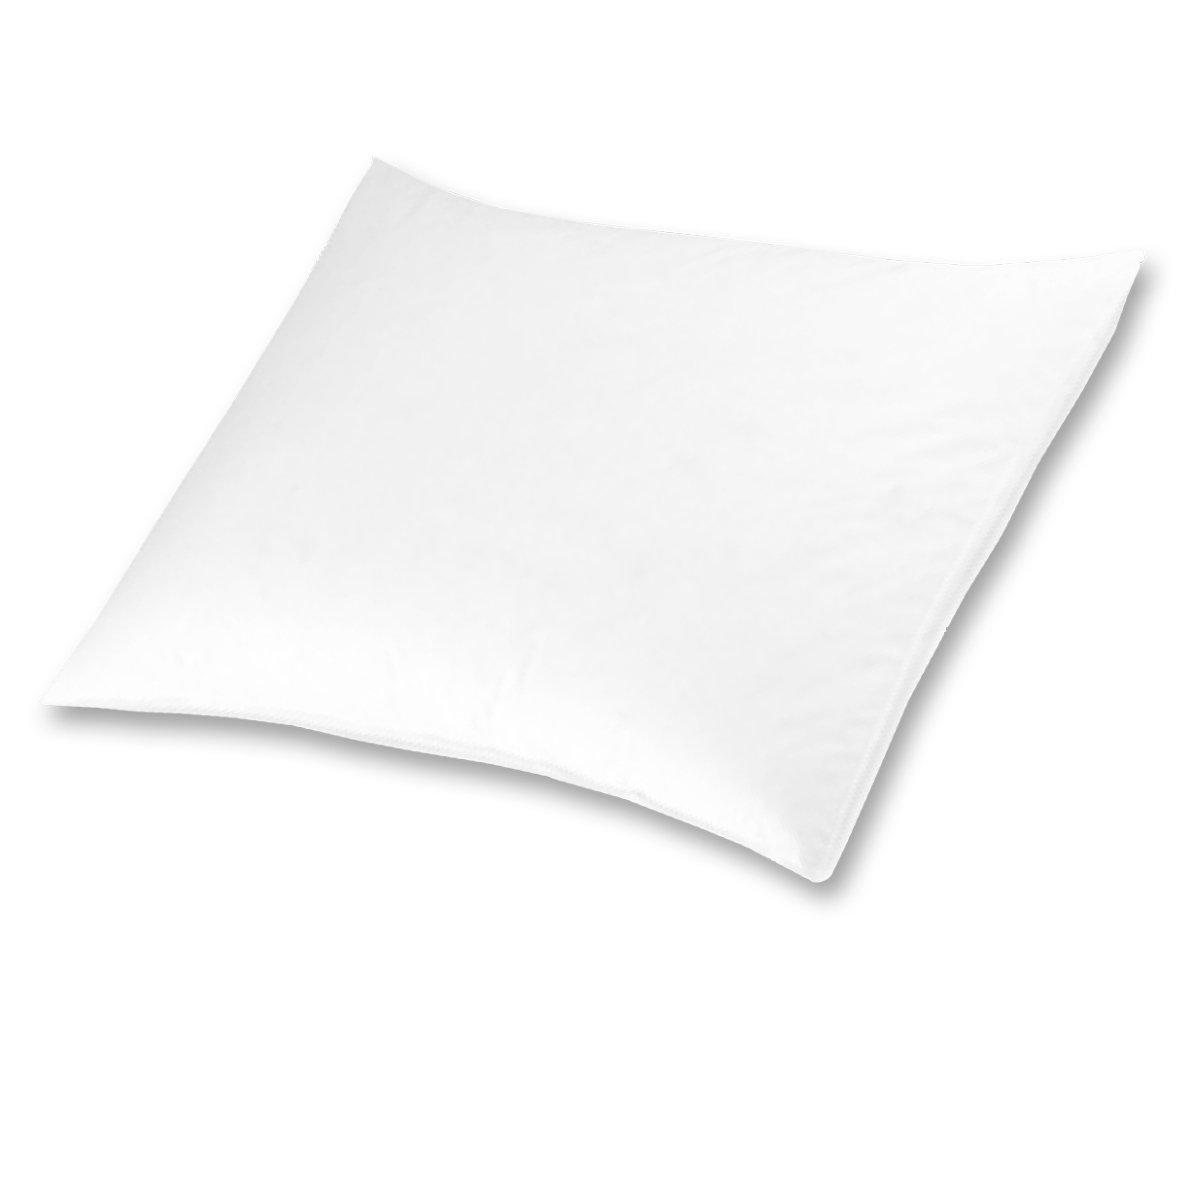 Heritage Premium White Goose Down Firm Density Queen Pillow